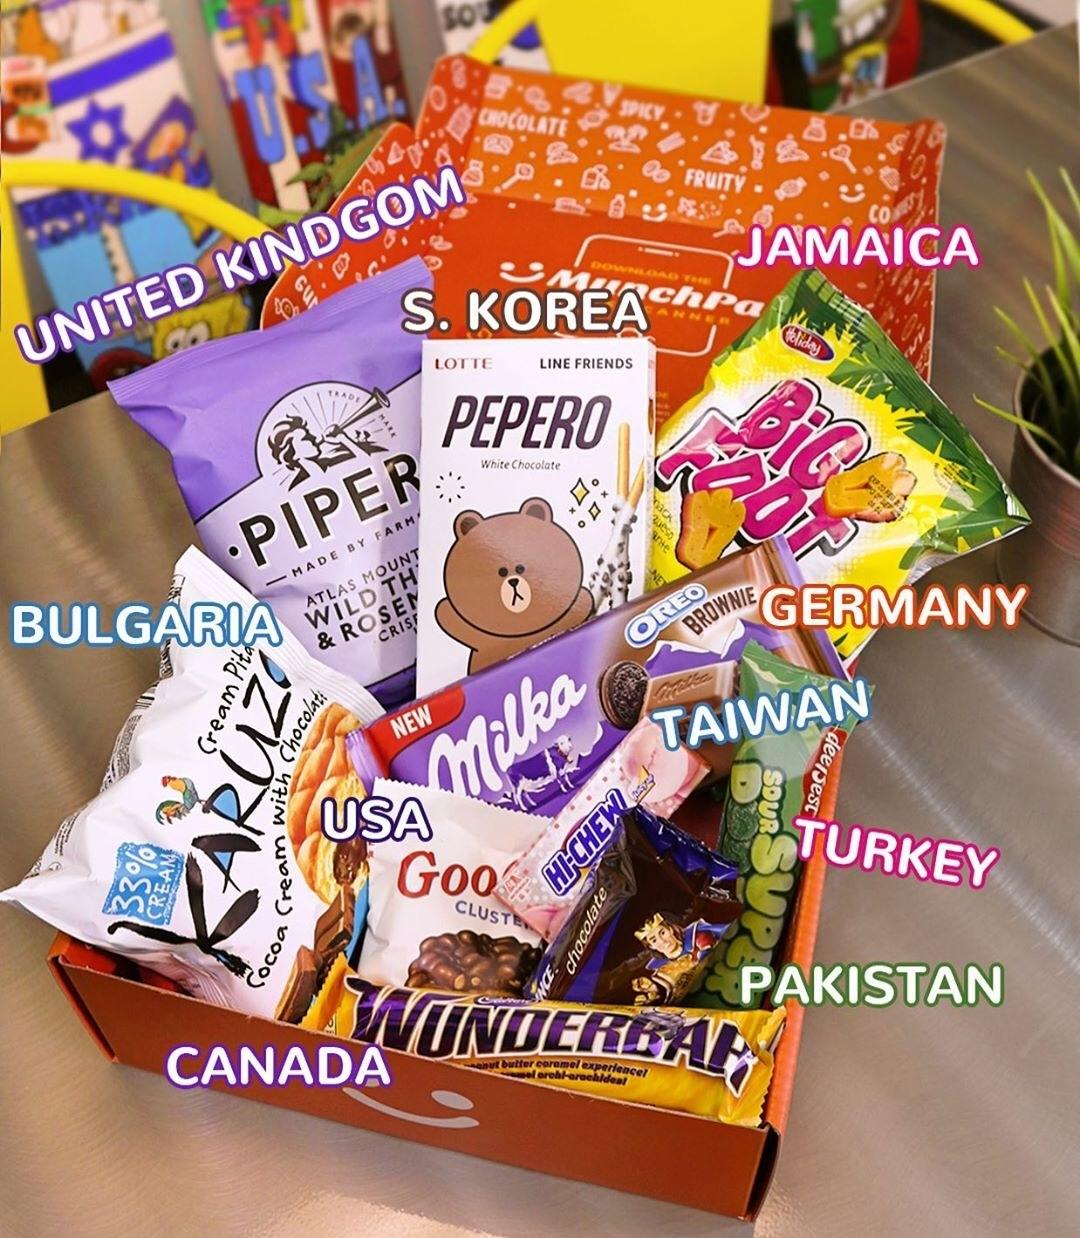 The MunchPak box containing snacks from the United Kingdom, South Korea, Jamaica, Germany, Taiwan, Turkey, Pakistan, Bulgaria, and Canada